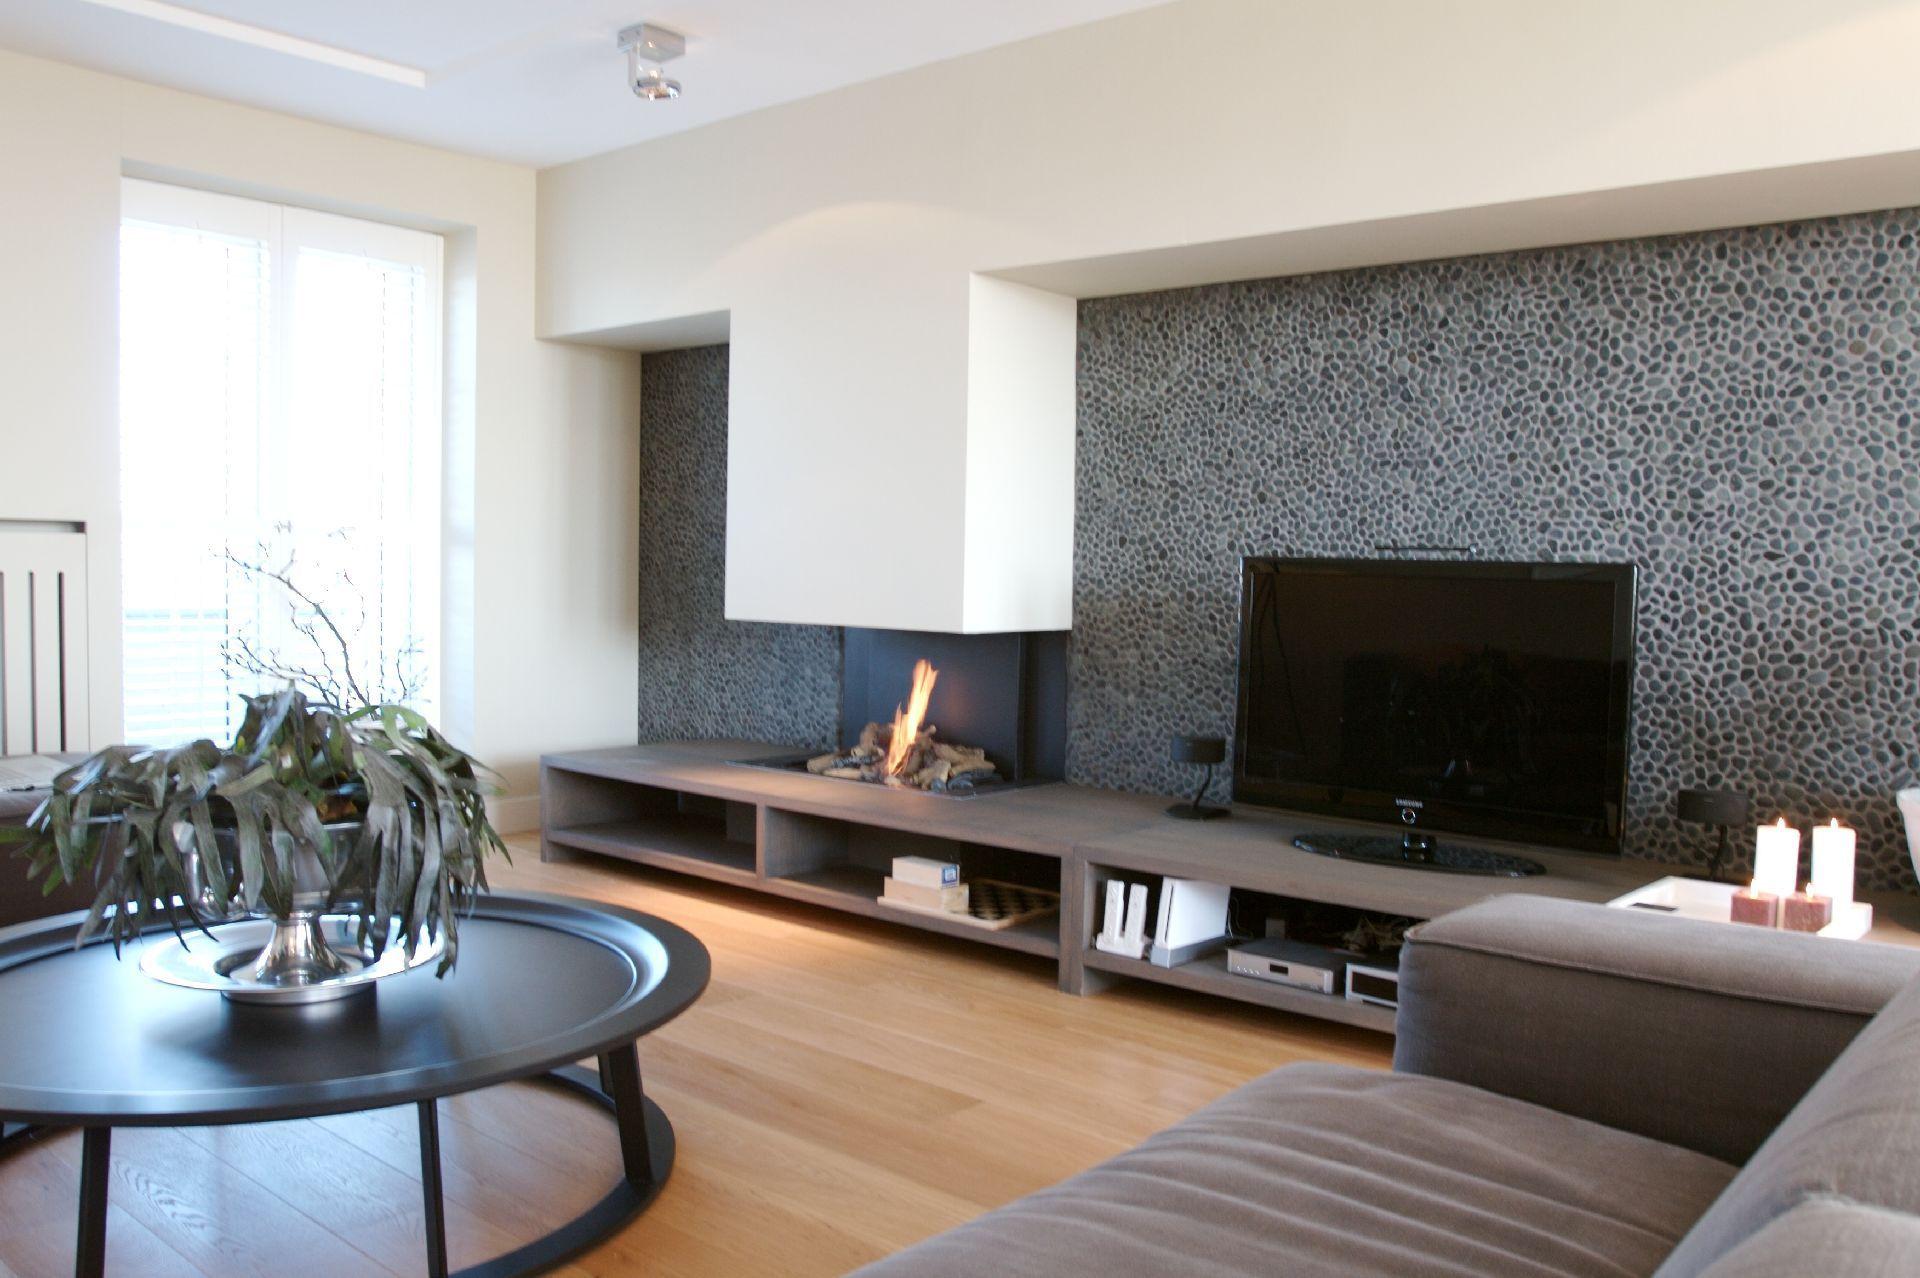 Houtlook tegels woonkamer keramisch parket leggen home pinterest